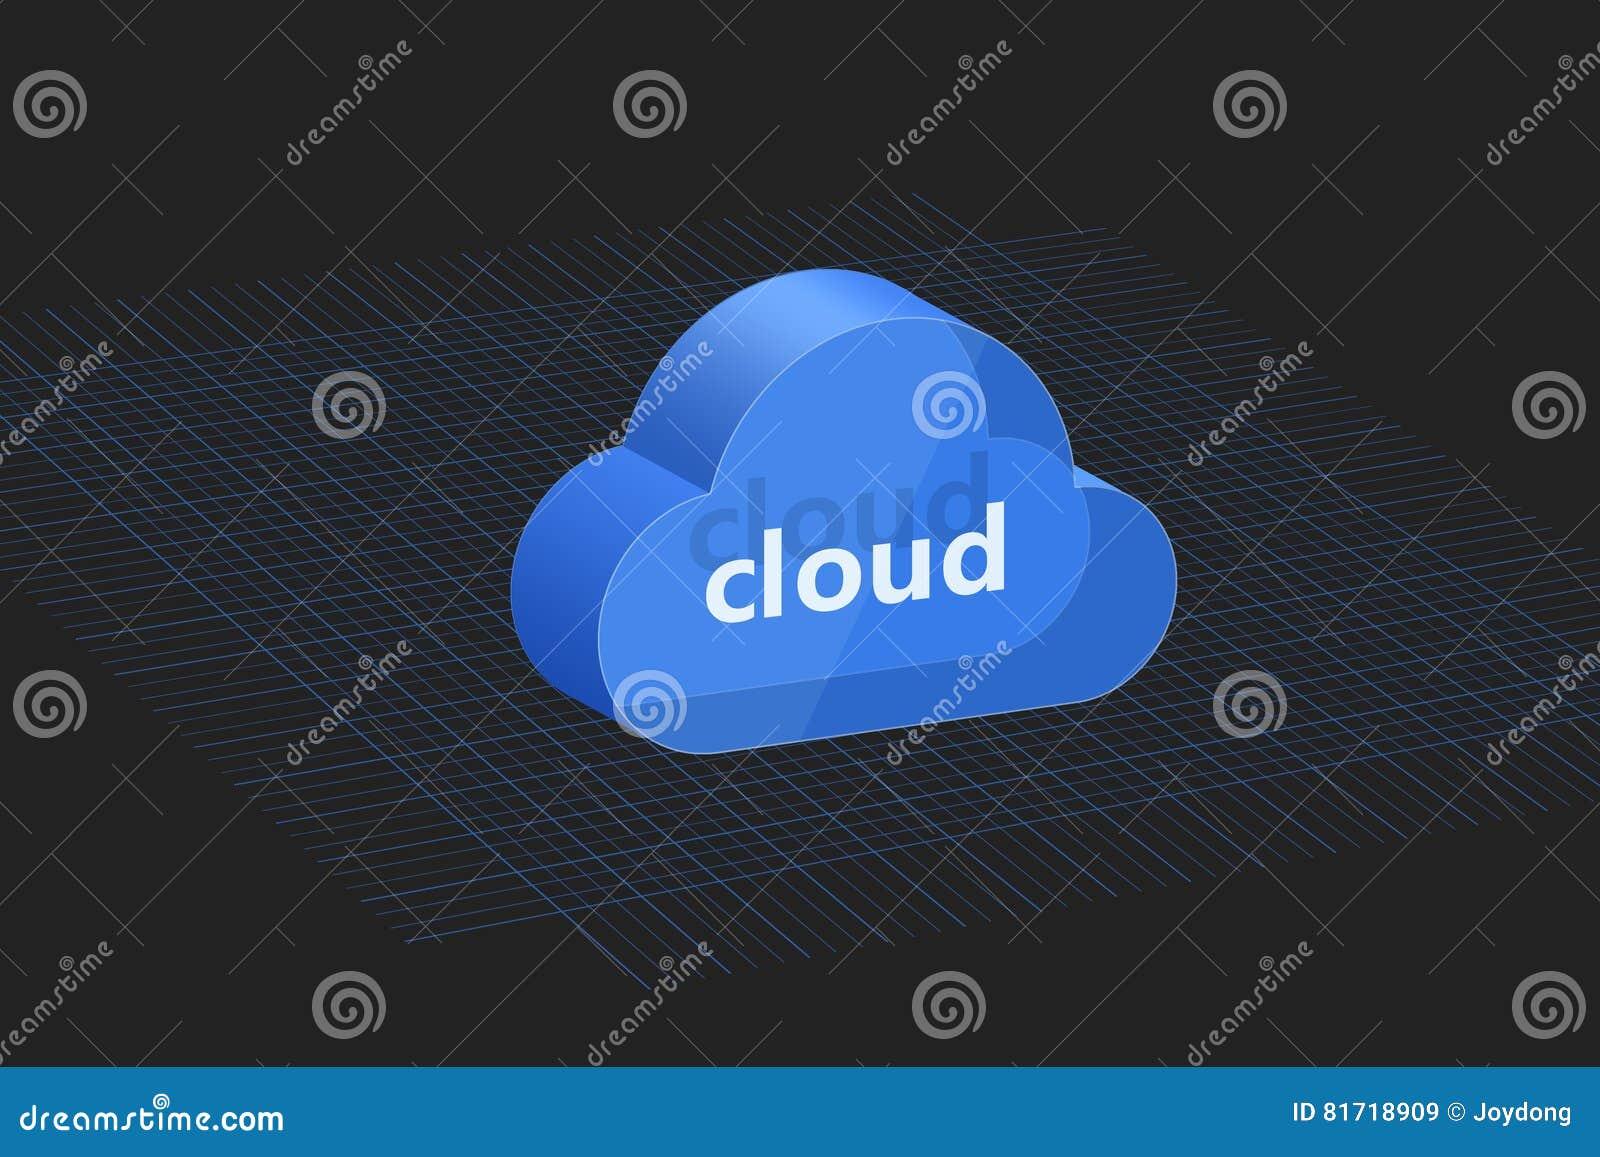 Fondo integrado por la nube azul tridimensional